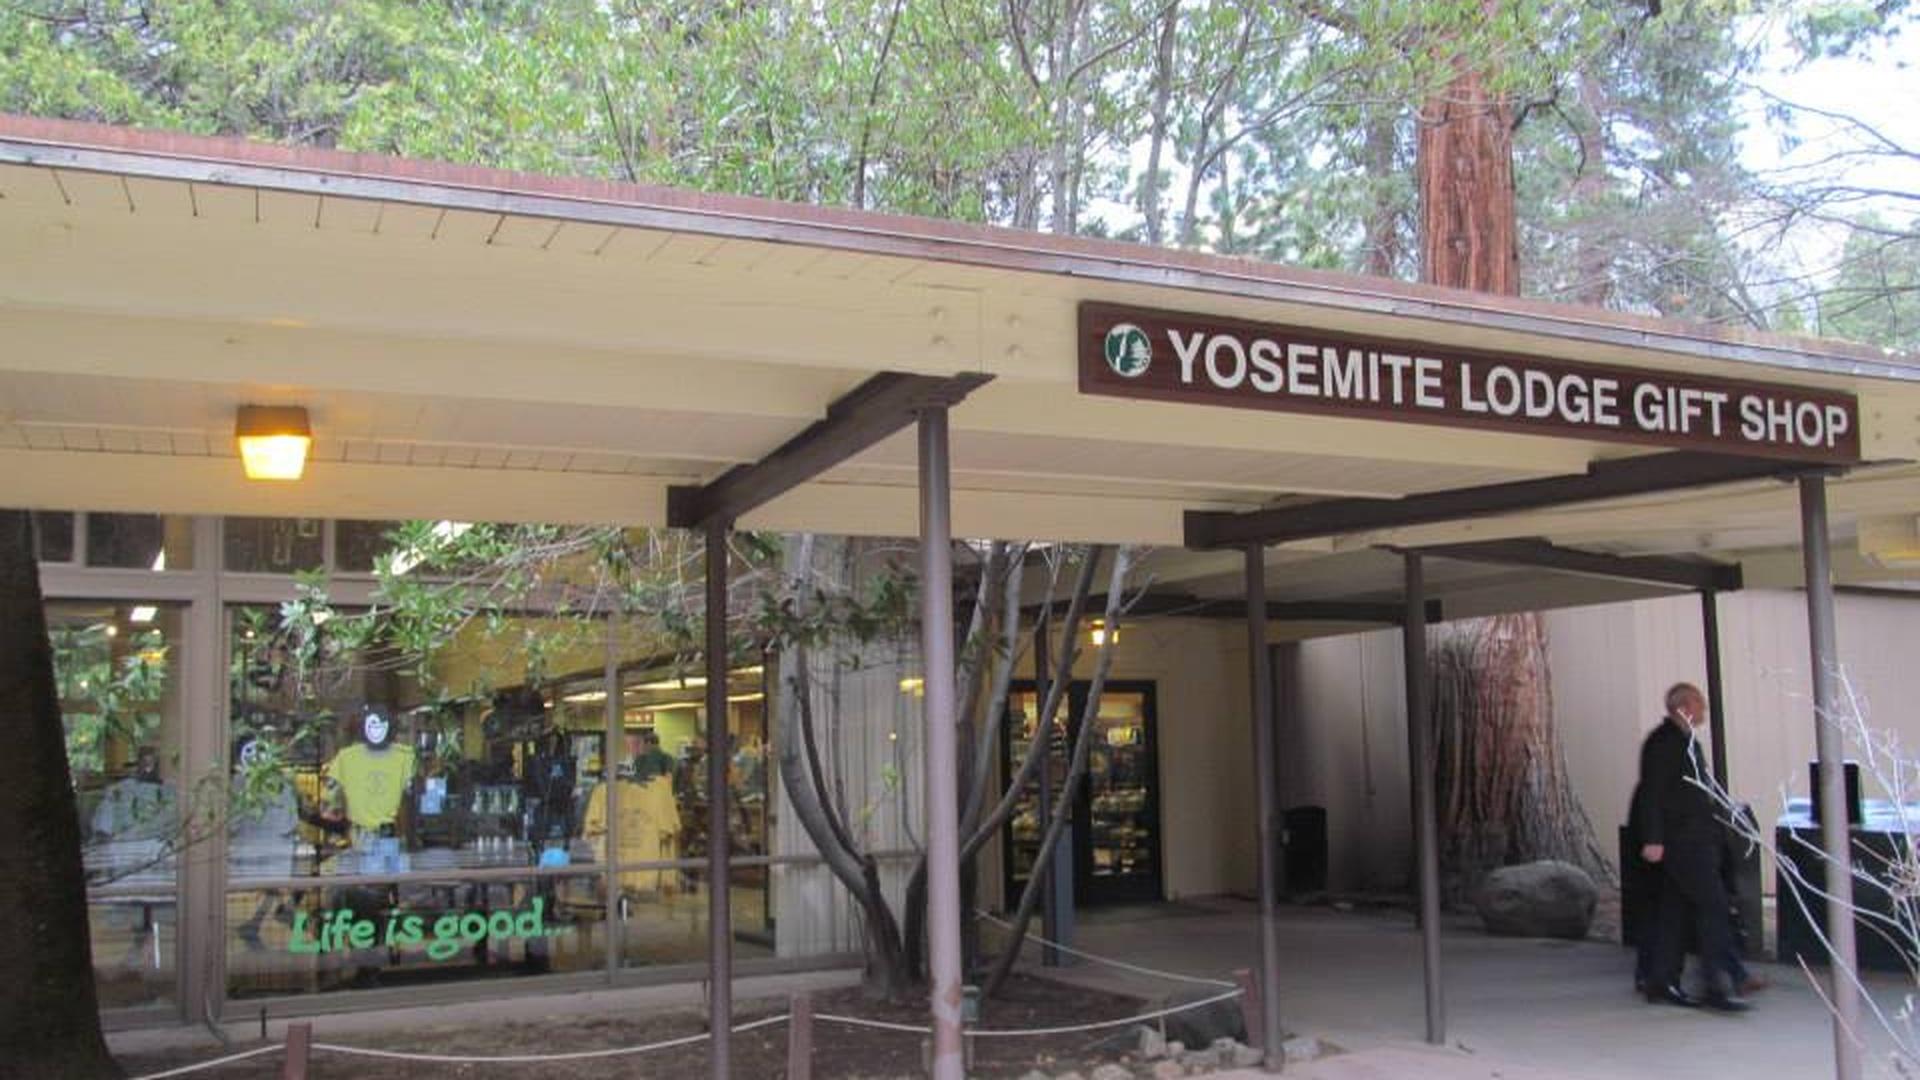 Yosemite Valley Lodge Gift Shop